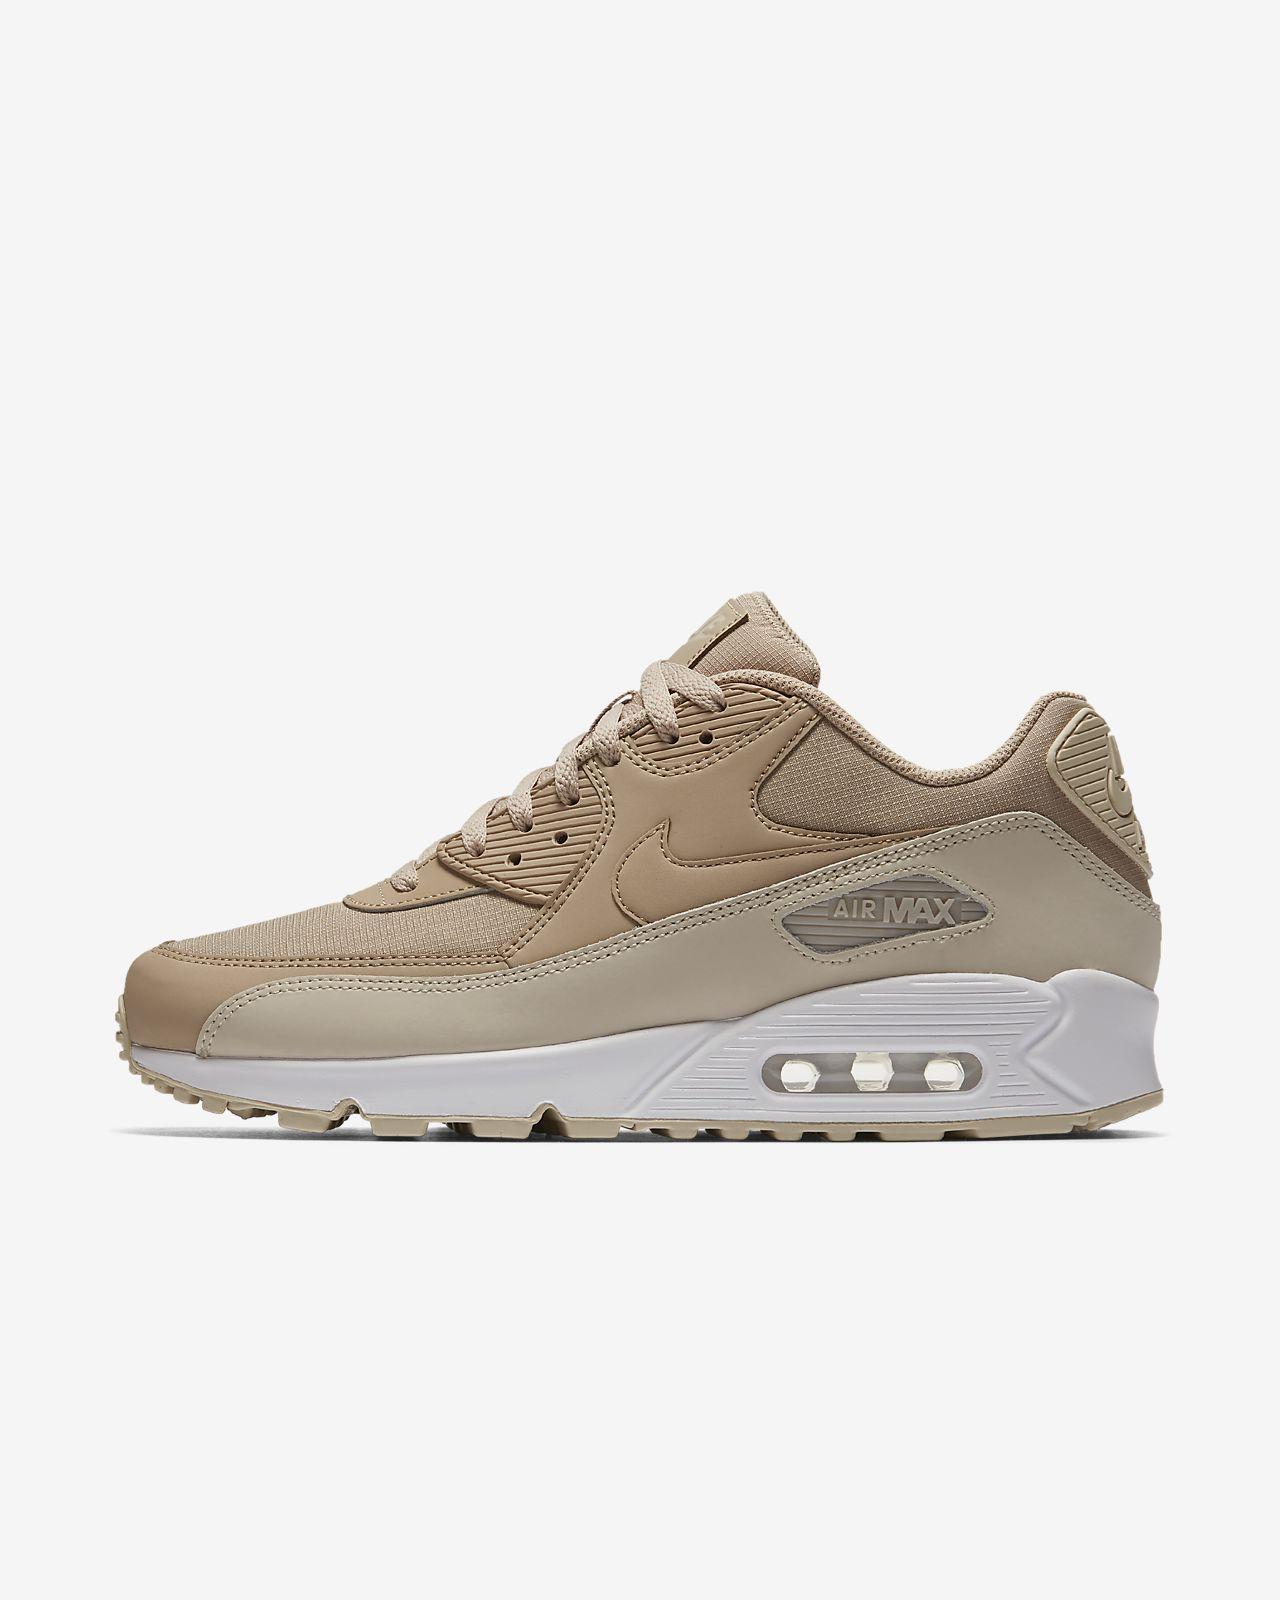 ... Chaussure Nike Air Max 90 Essential pour Homme